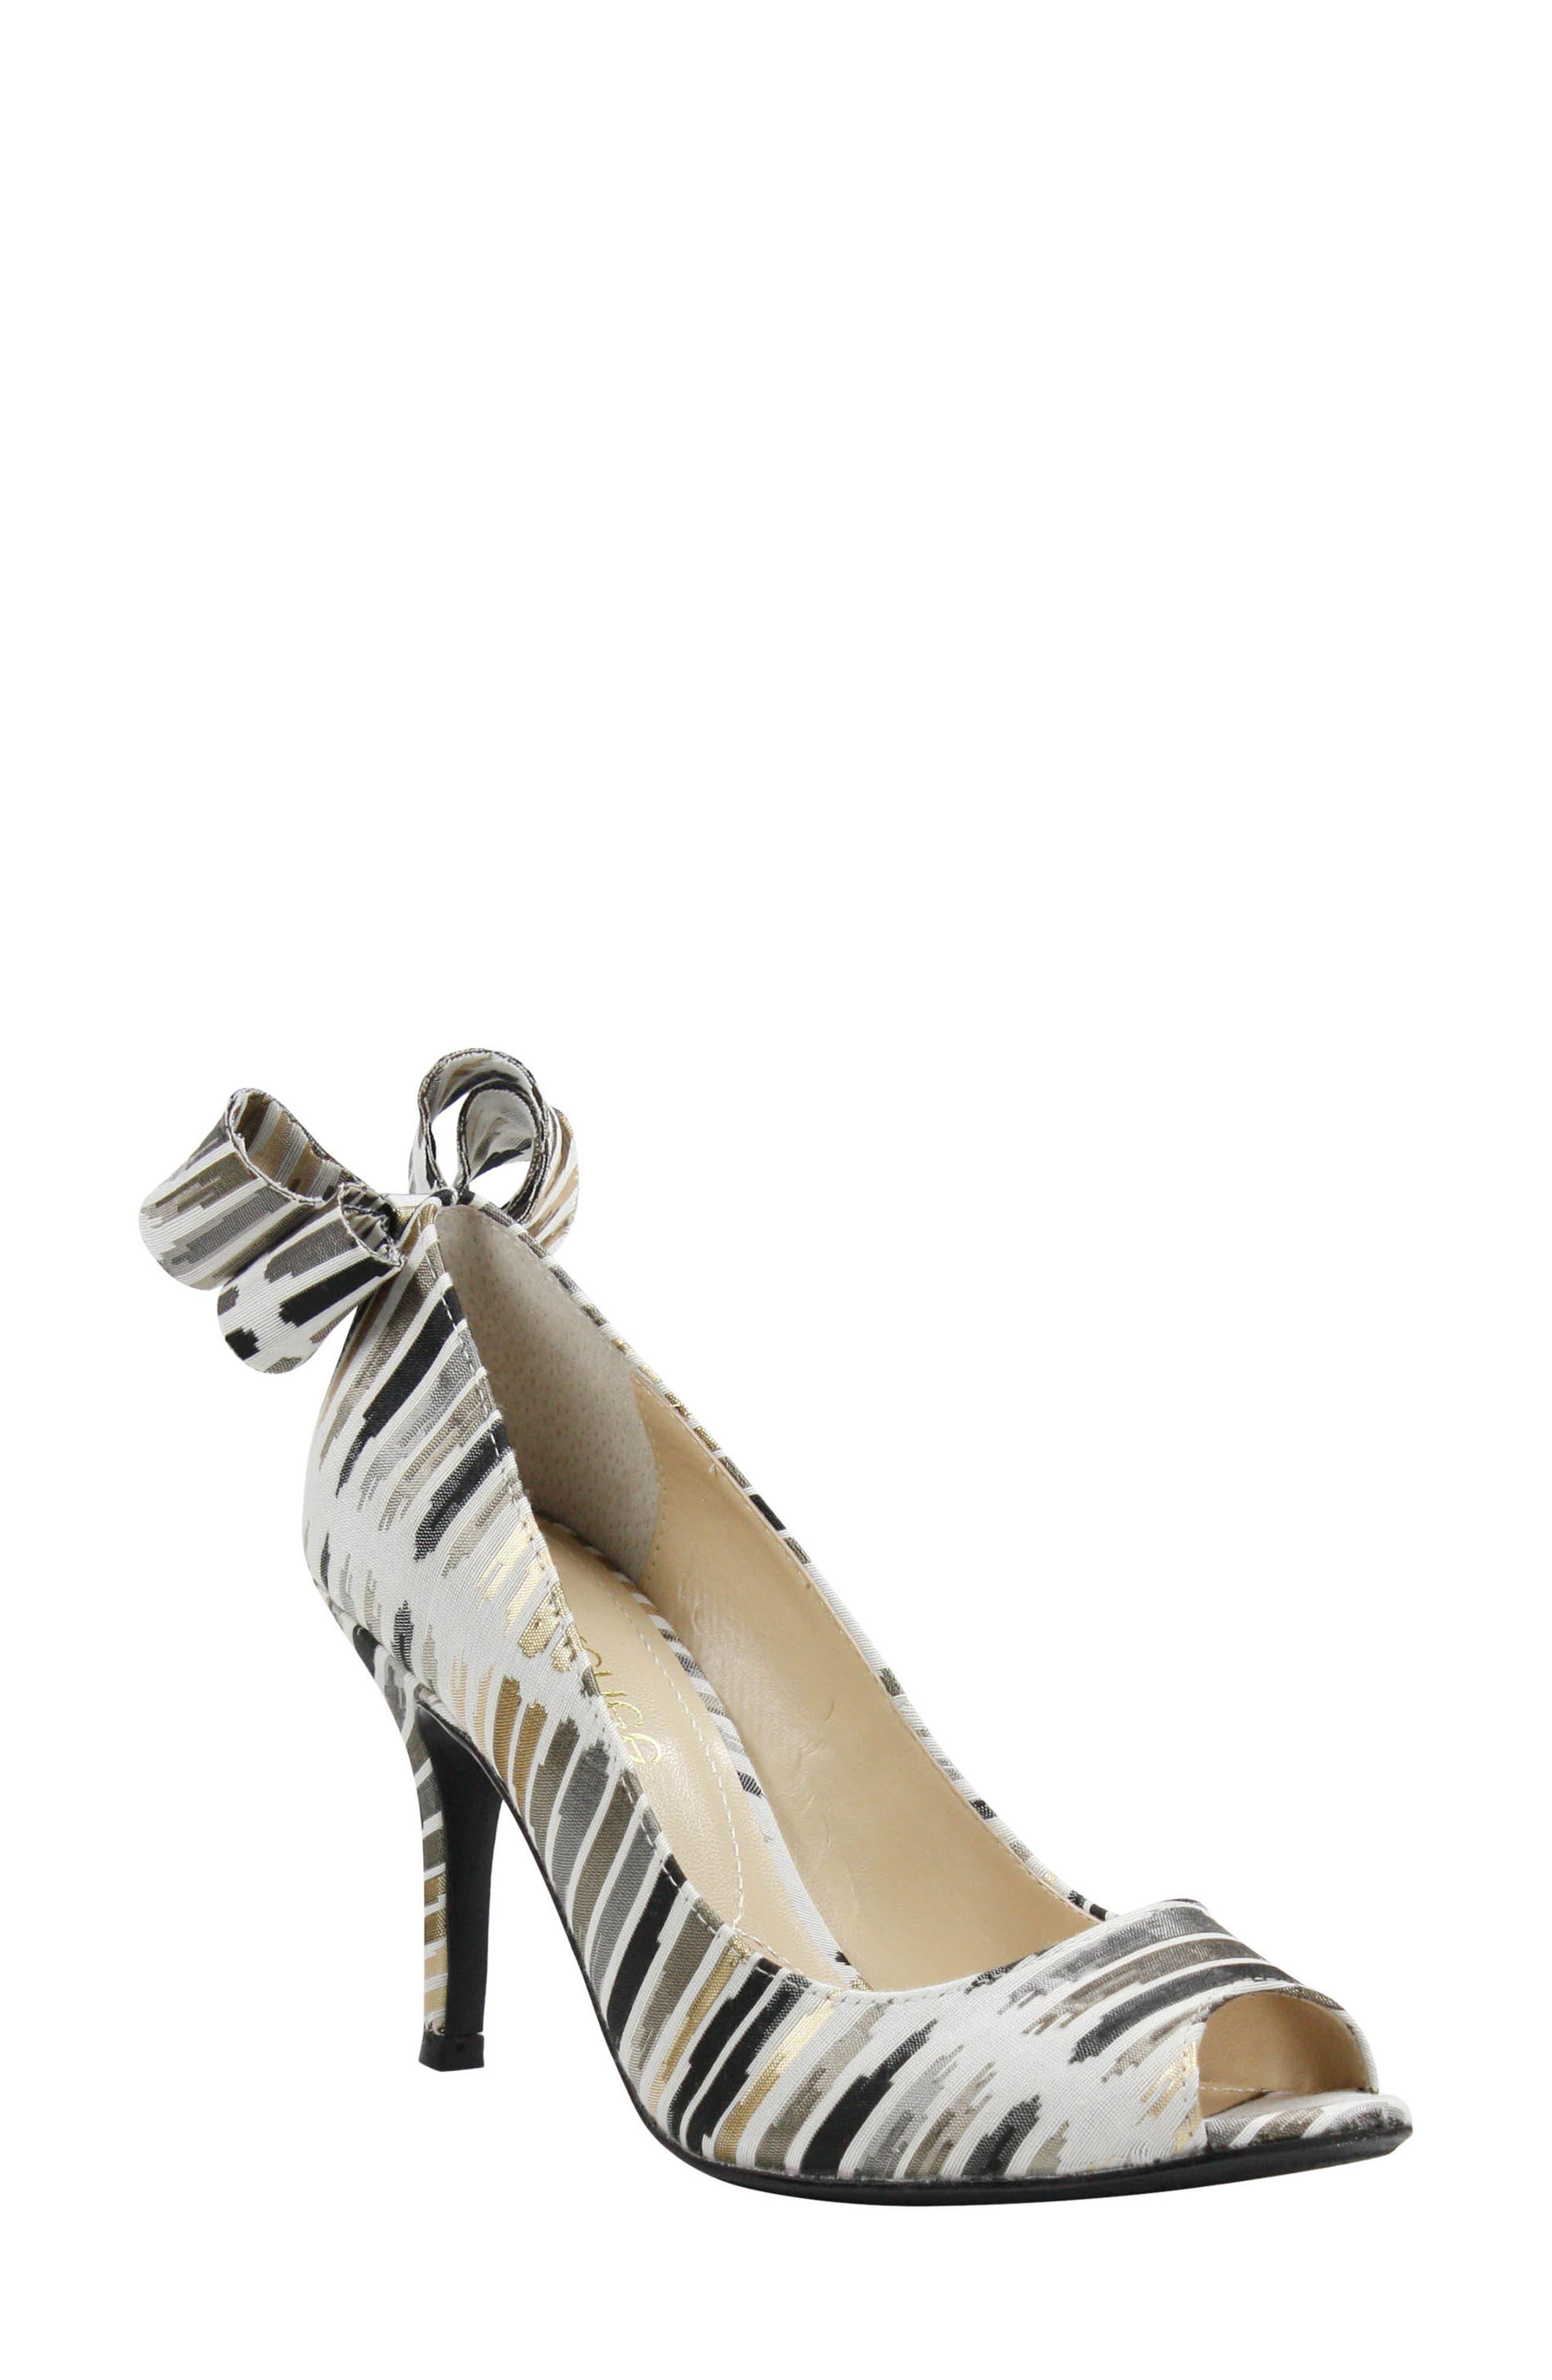 Ellasee Bow Peep Toe Pump,                             Main thumbnail 1, color,                             Cream/ Black/ Gold Fabric